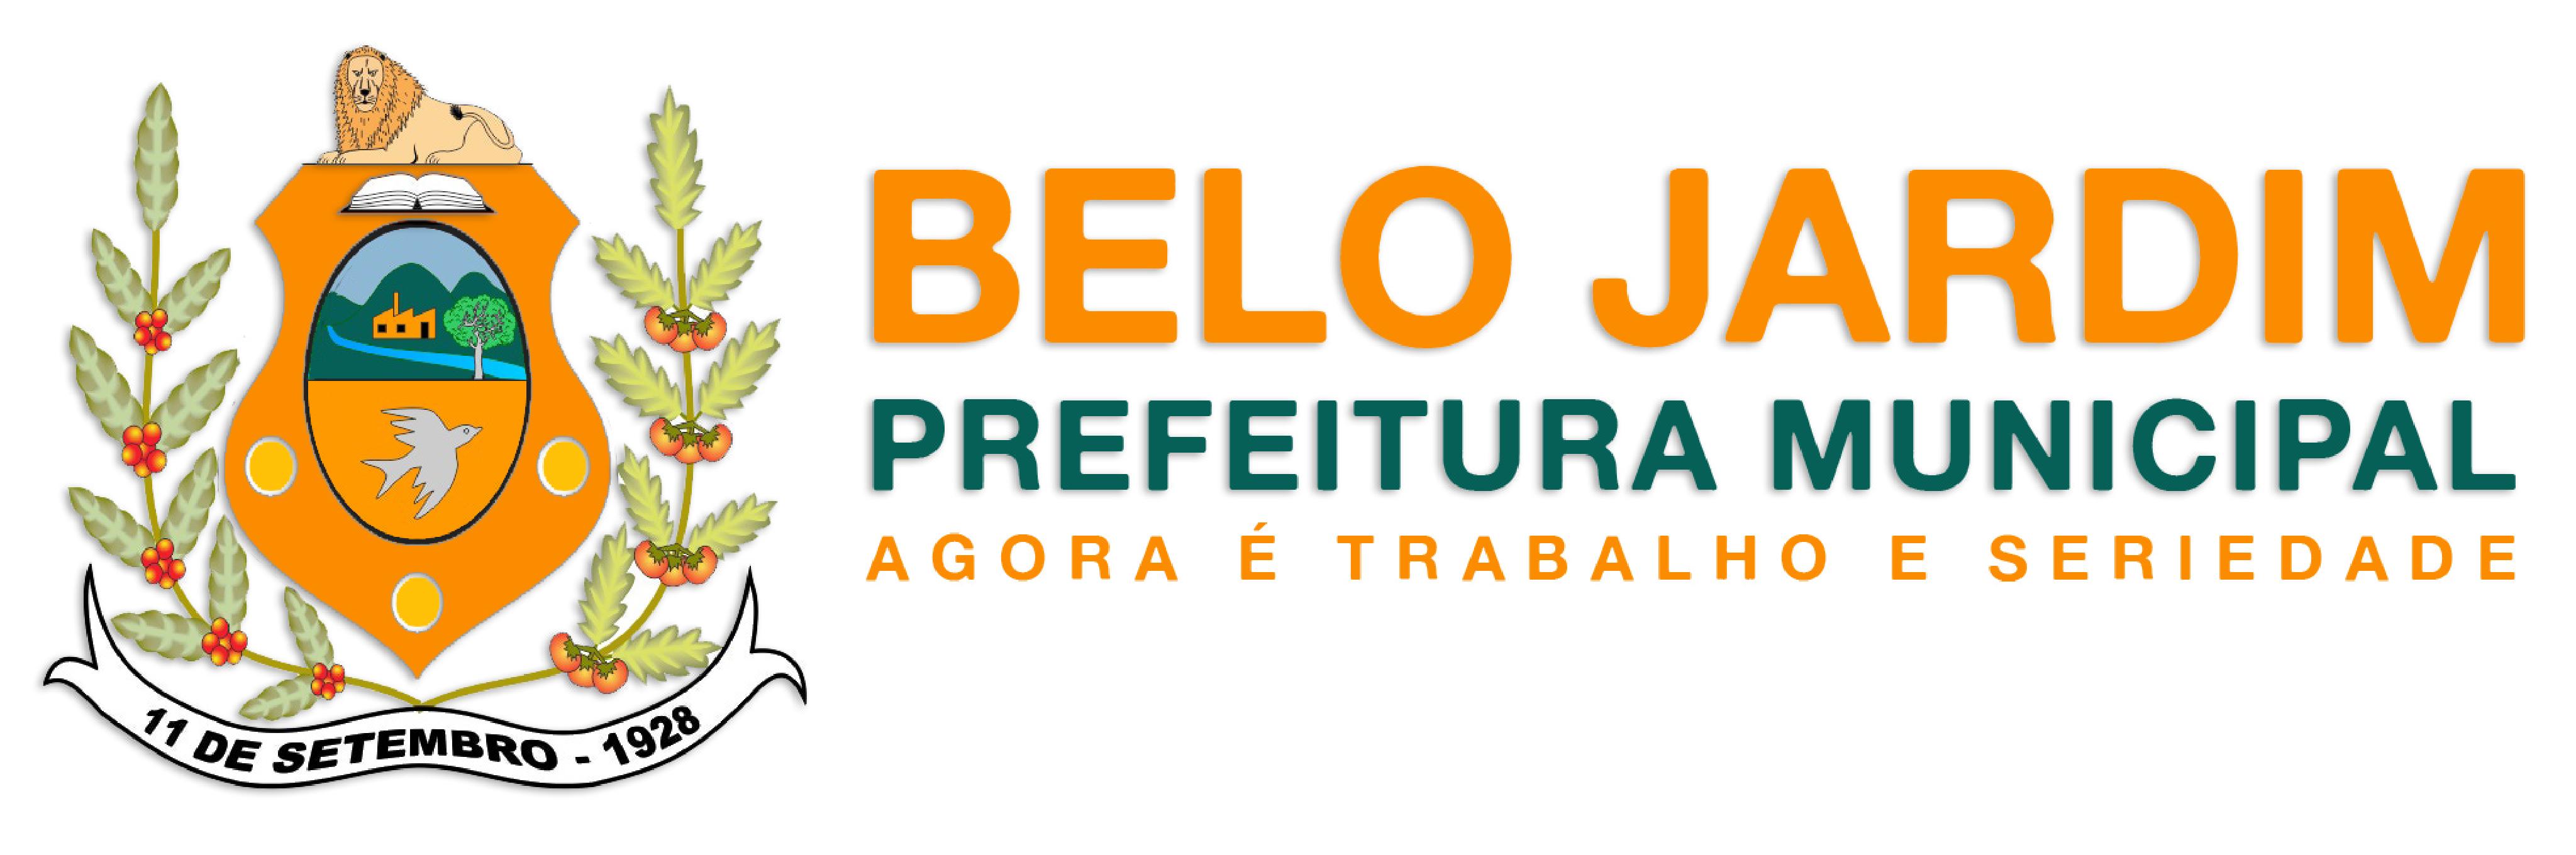 Prefeitura de Belo Jardim logo